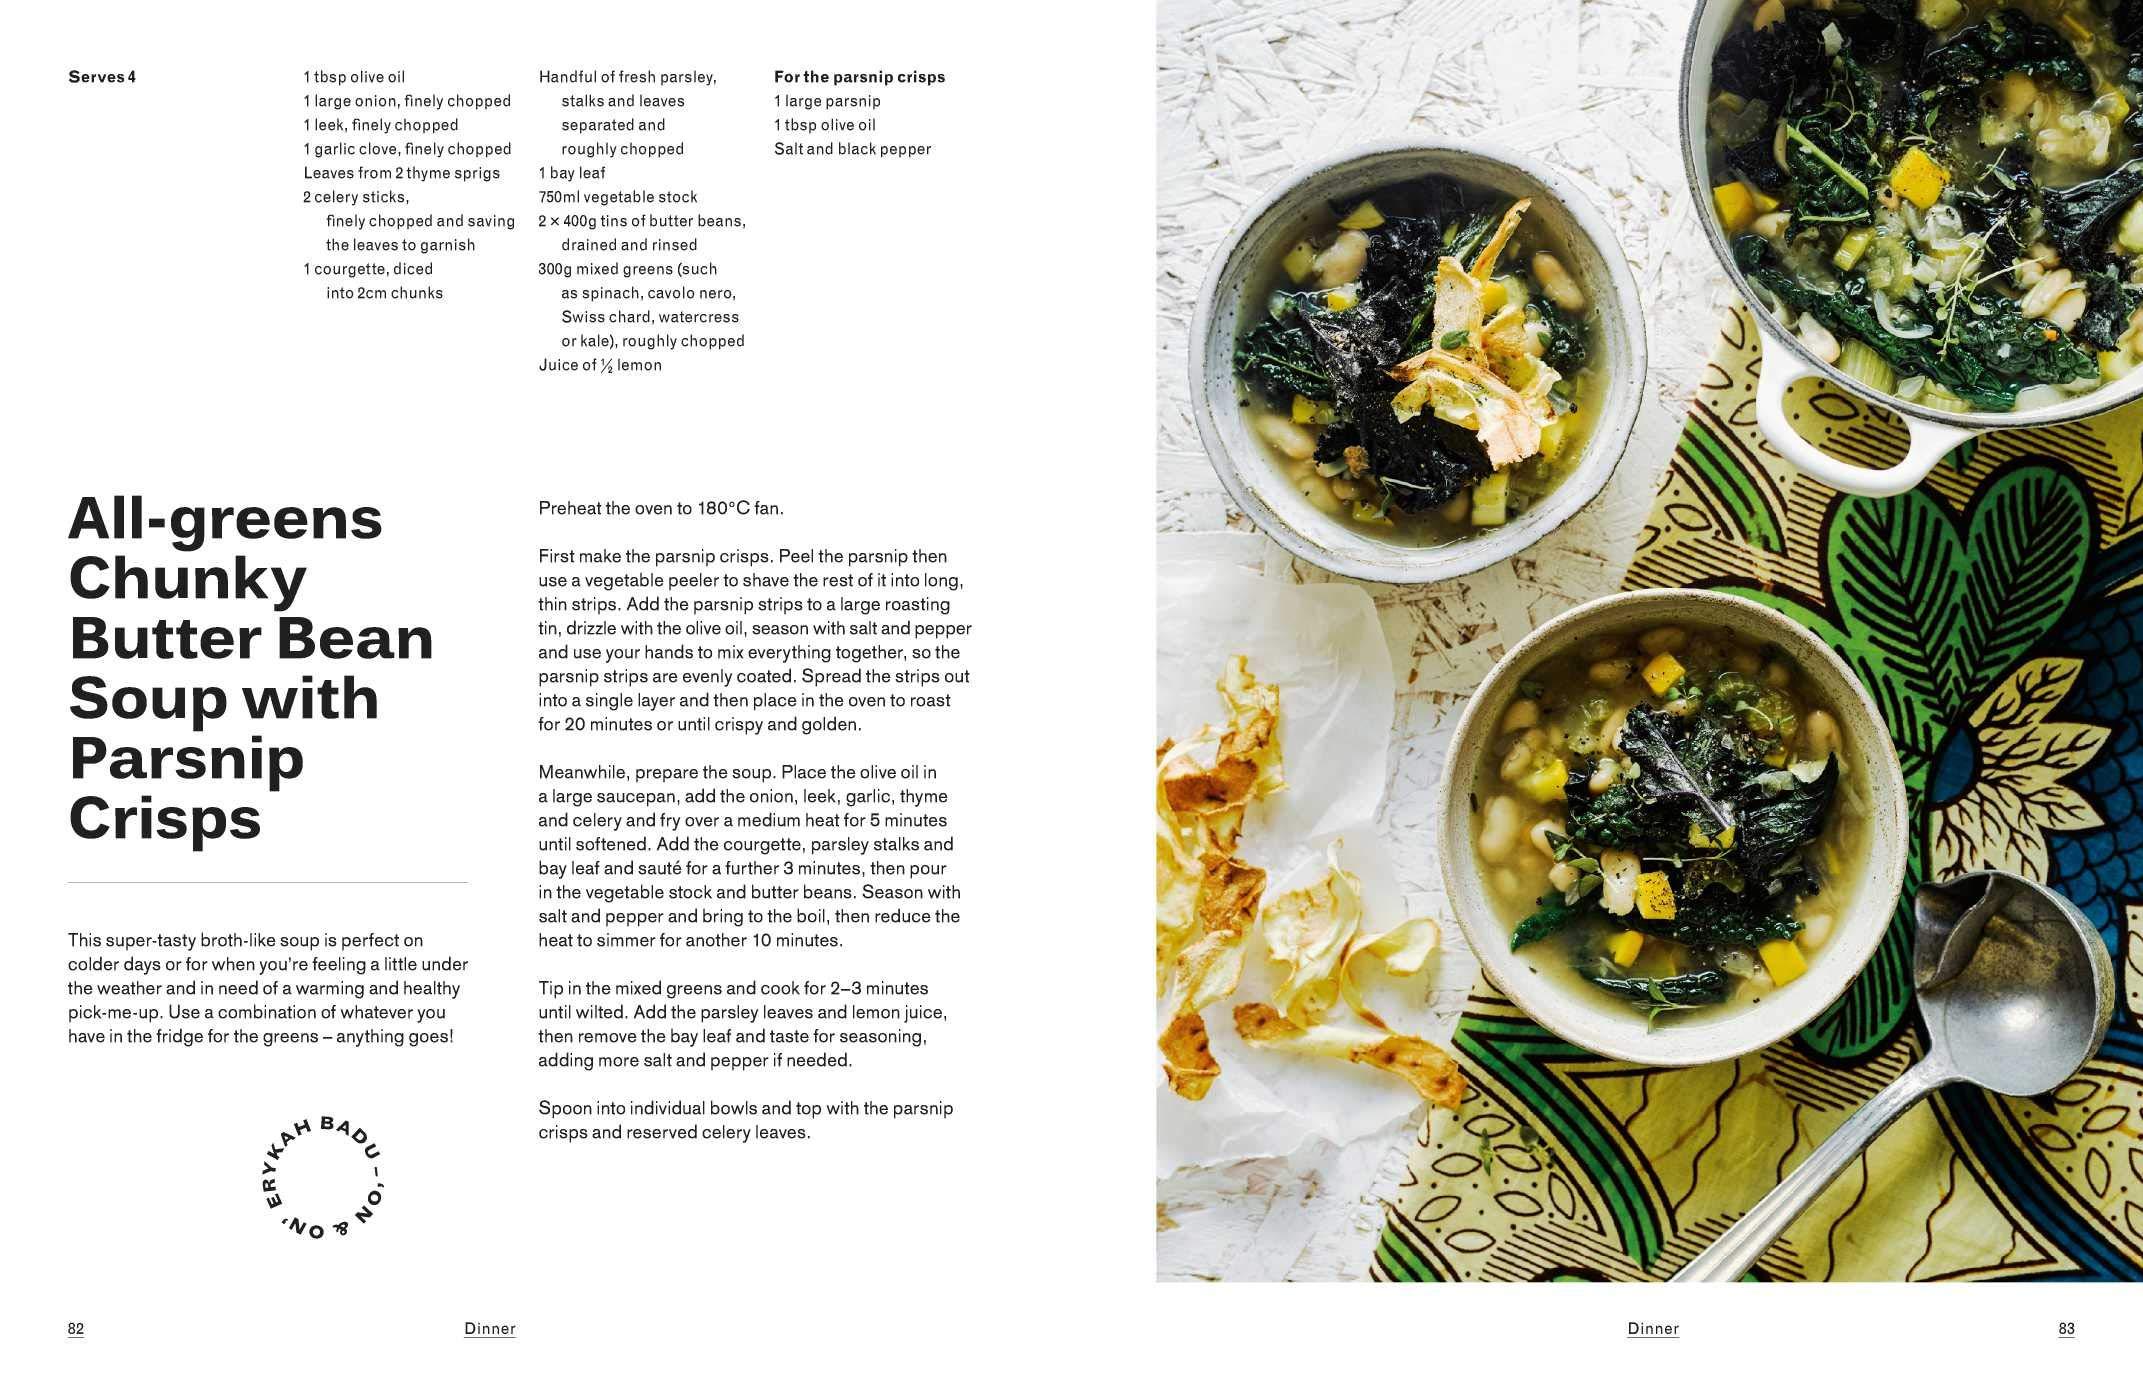 Rachel Ama's Vegan Eats: Tasty plant-based recipes for every day 6